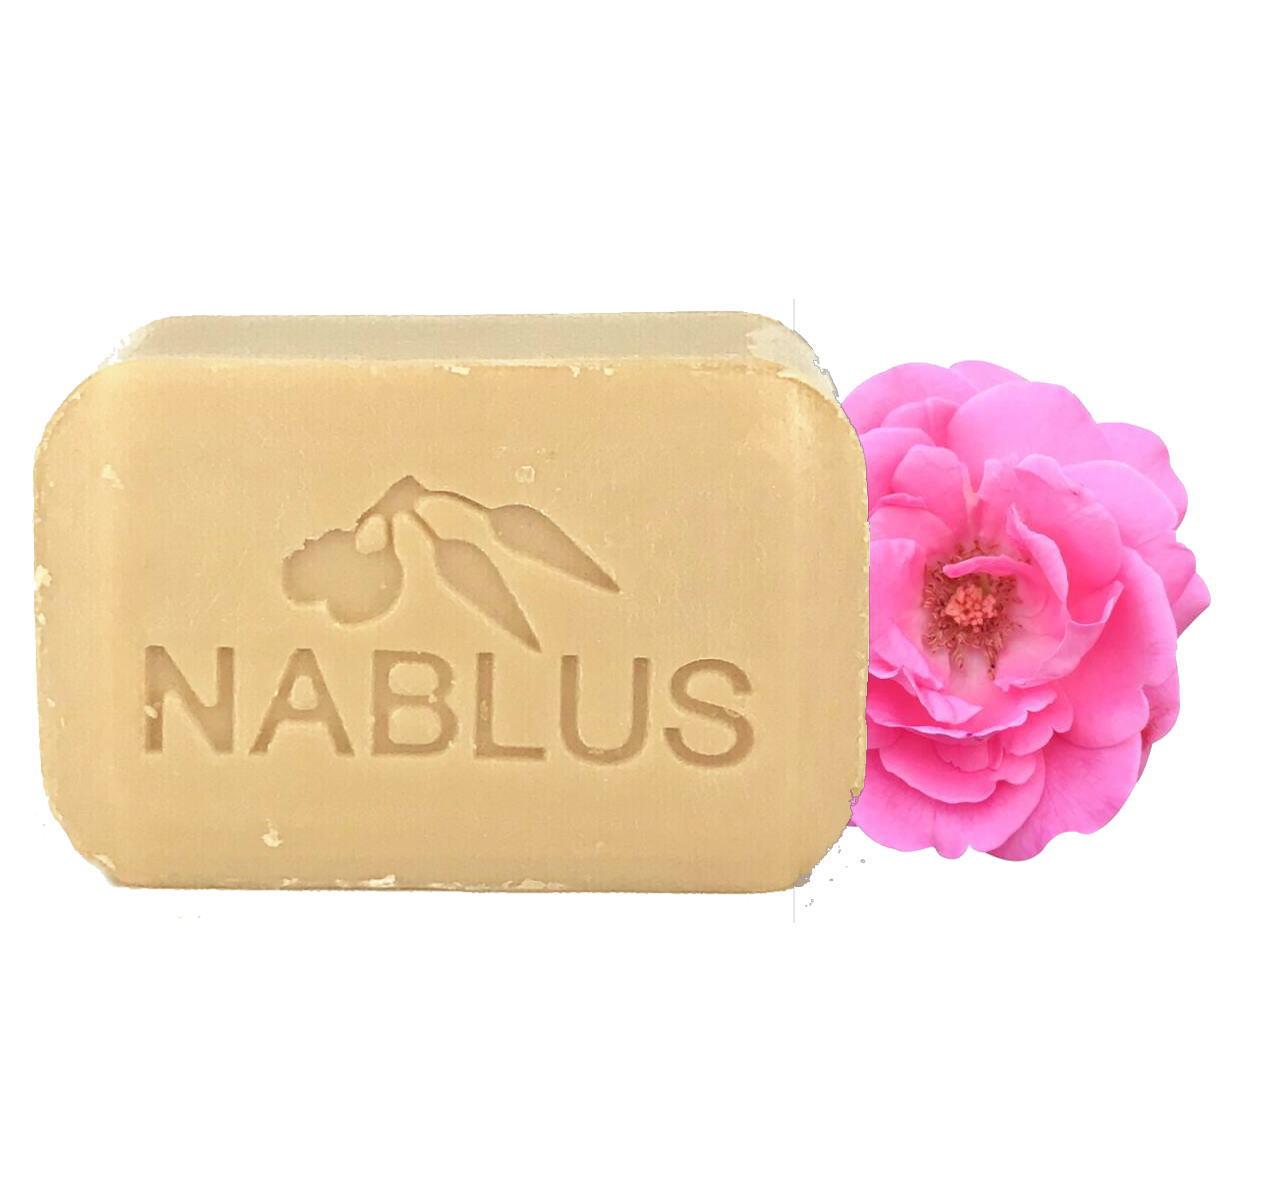 Nablus Soap ナーブルスソープ - ダマスクローズ - オーガニック石鹸